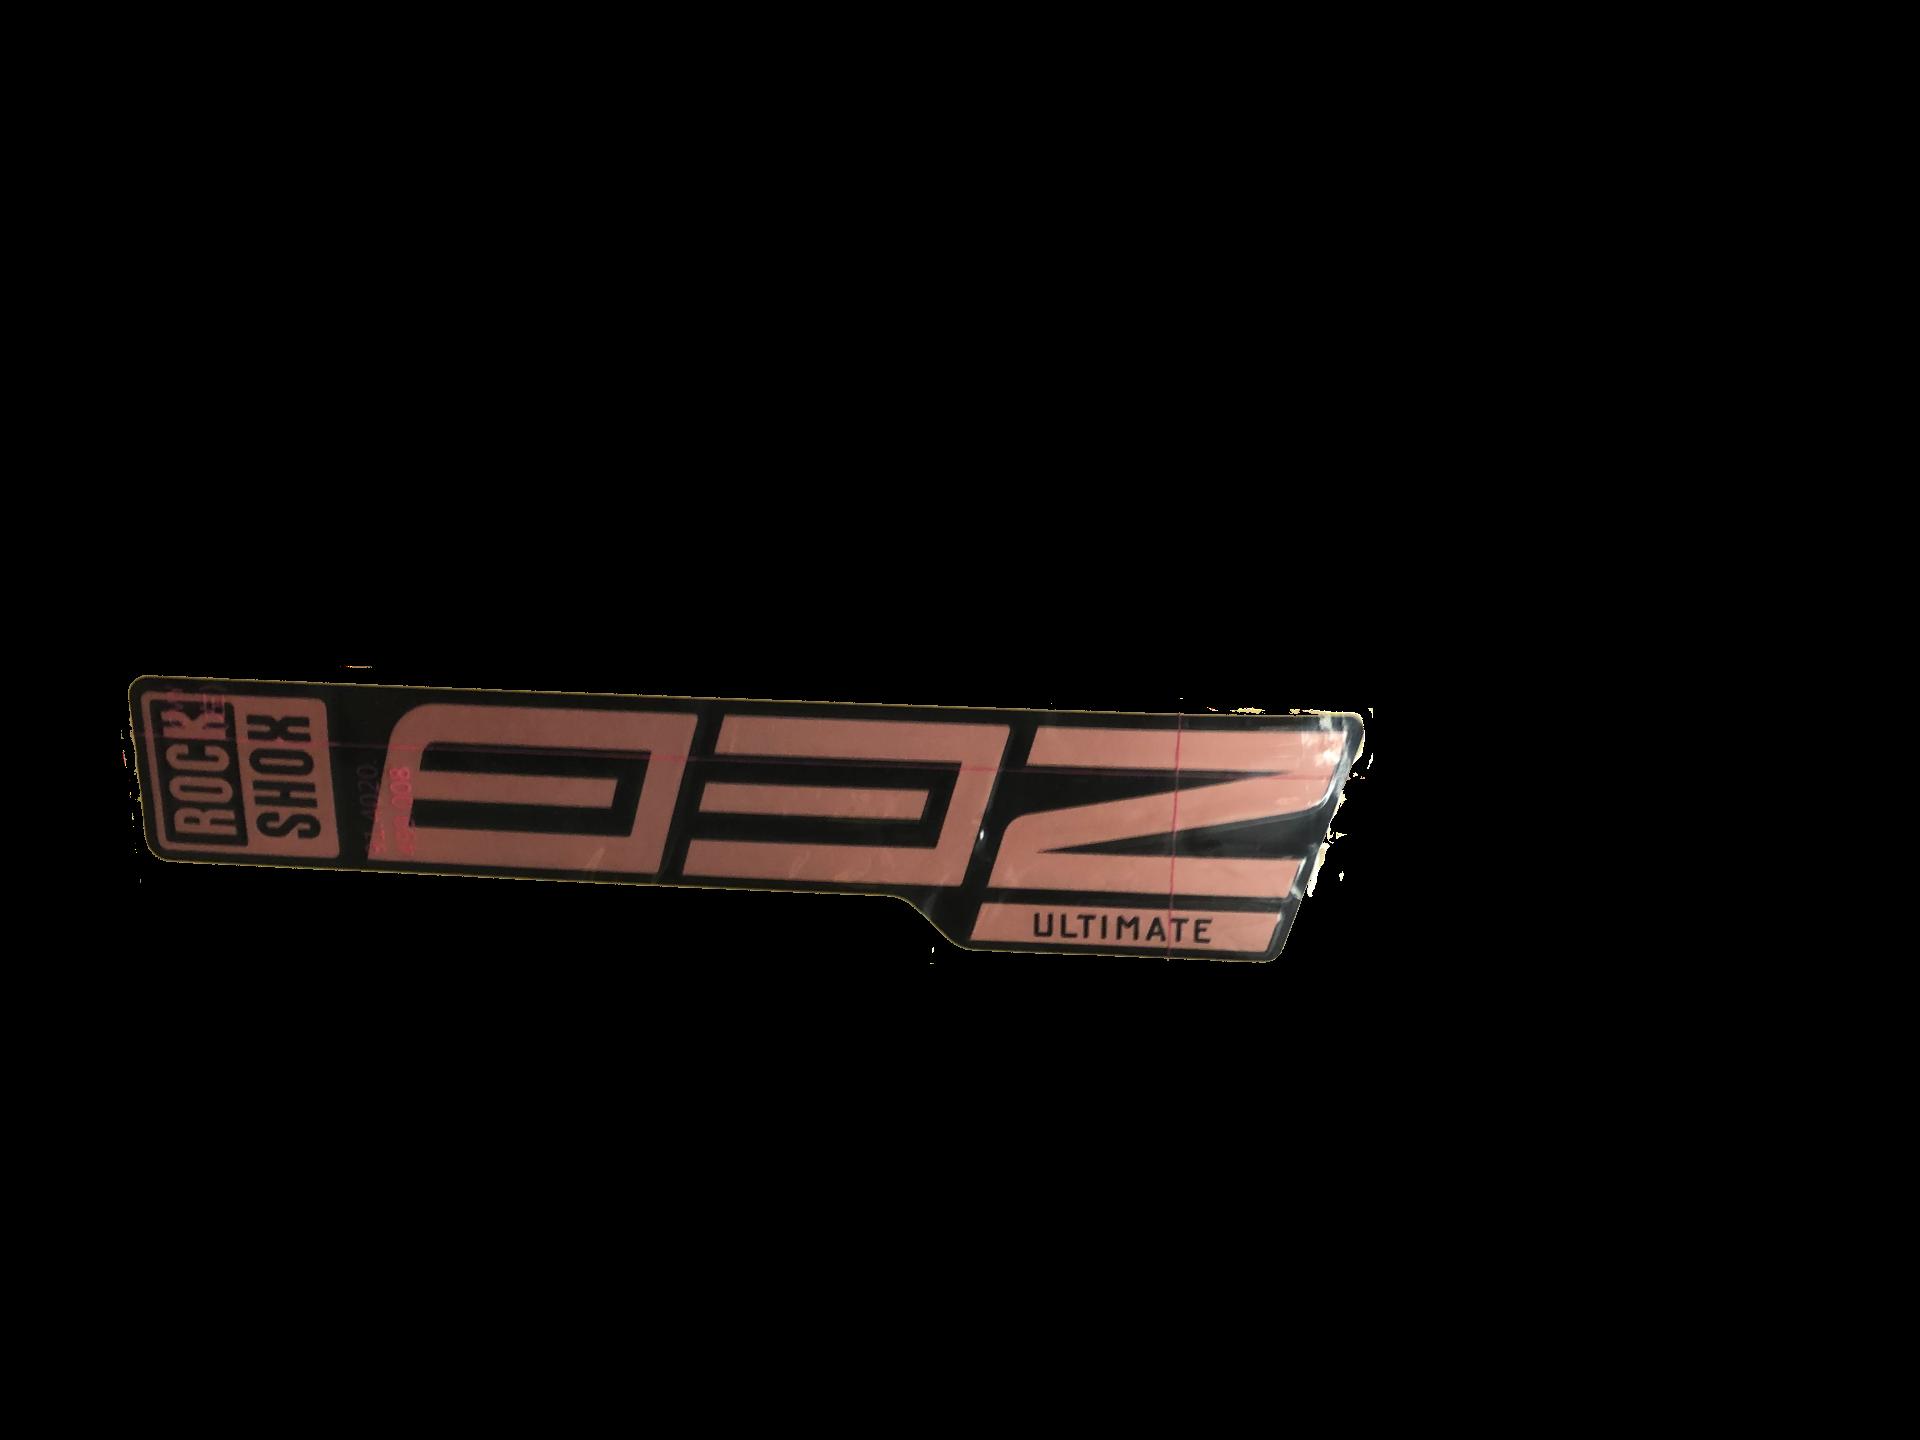 Zeb Ultimate Decal Kit-2